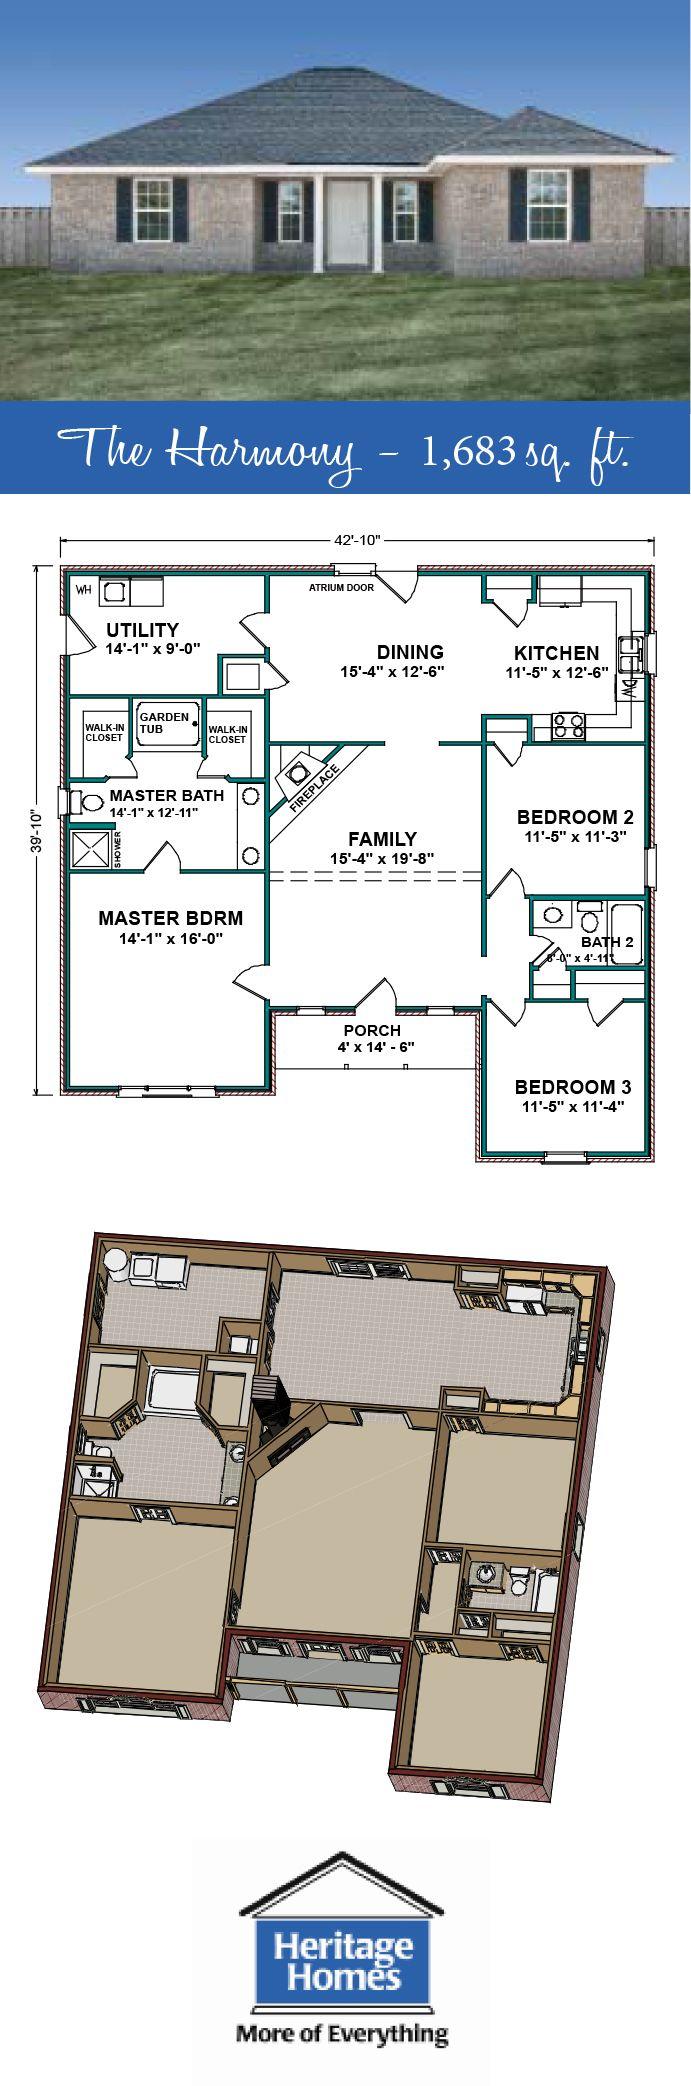 1 600 1 7000 Sq Ft Floor Plan The Harmony Is A 1 683 Sq Ft Home With 3 Beds 2 Baths Split Floor Pole Barn House Plans Barn House Plans Best House Plans